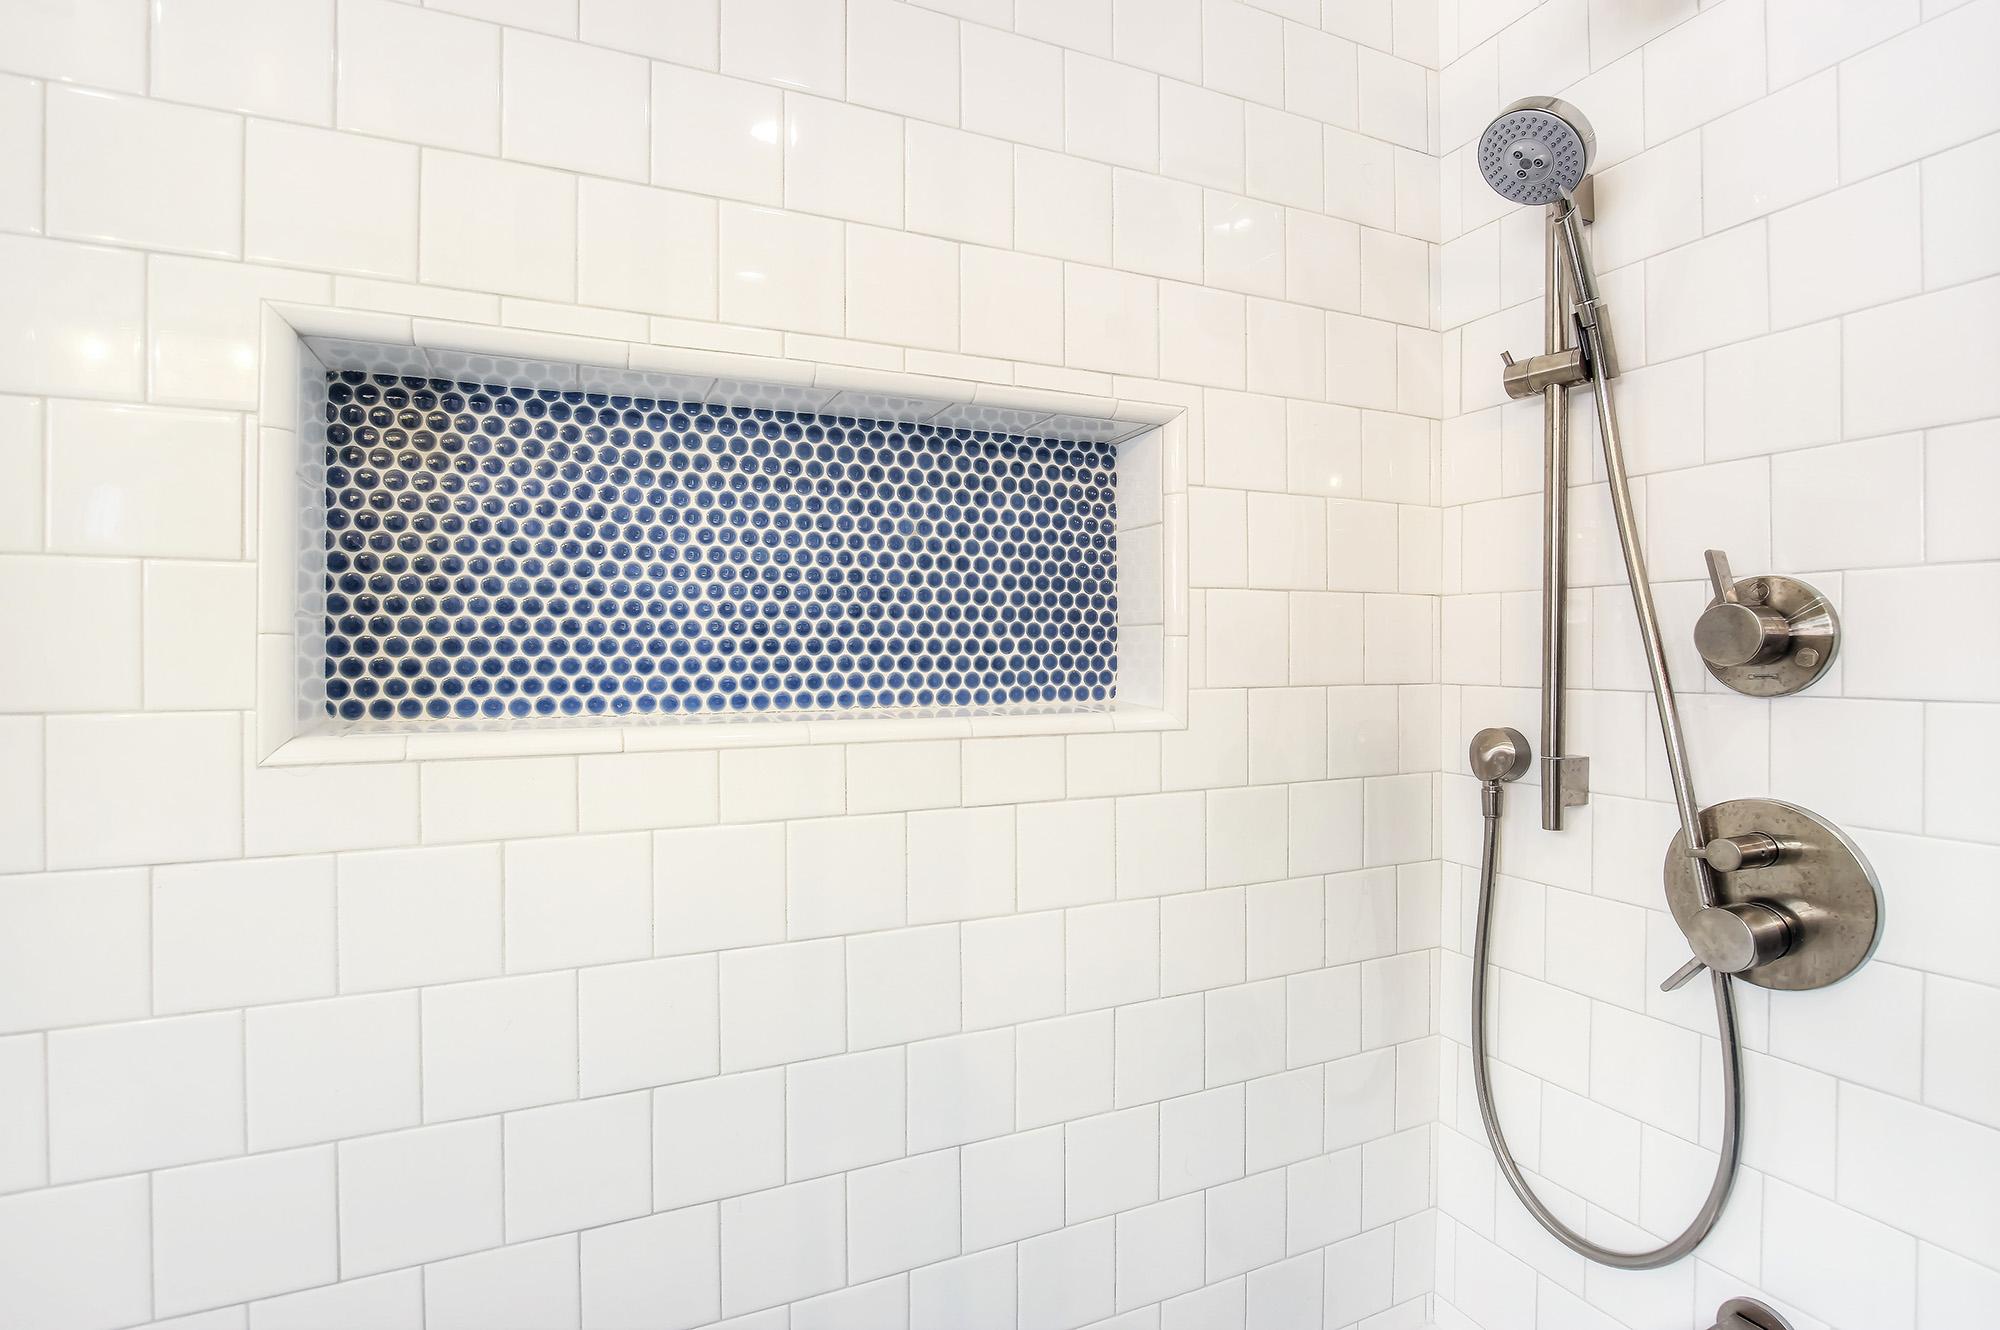 Toluca Lake bathroom remodel small 6.jpg